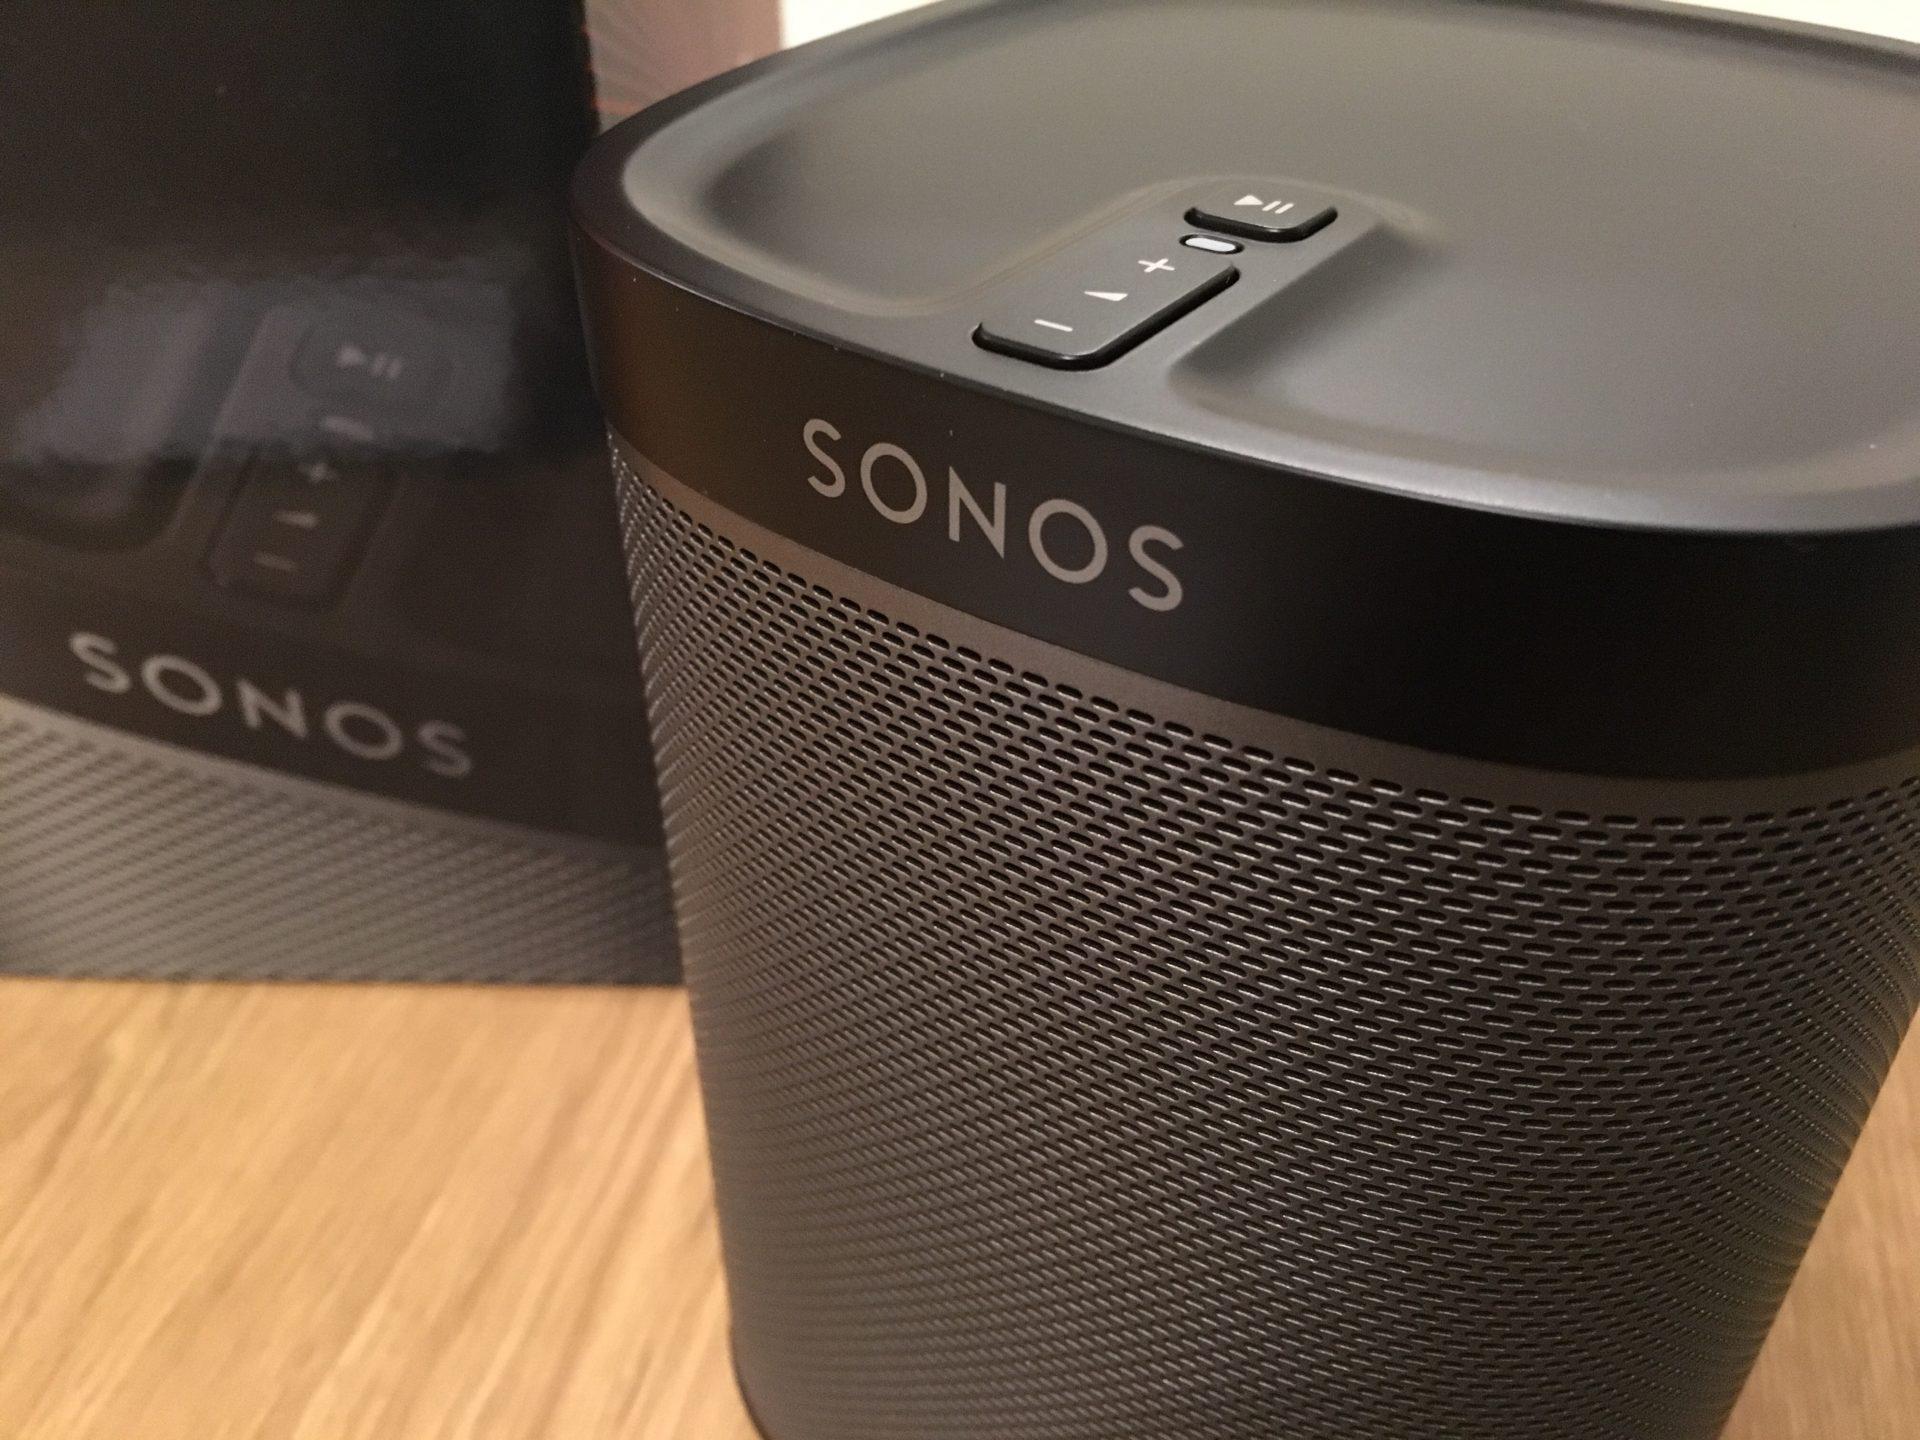 Sonos Play:1 wireless speaker